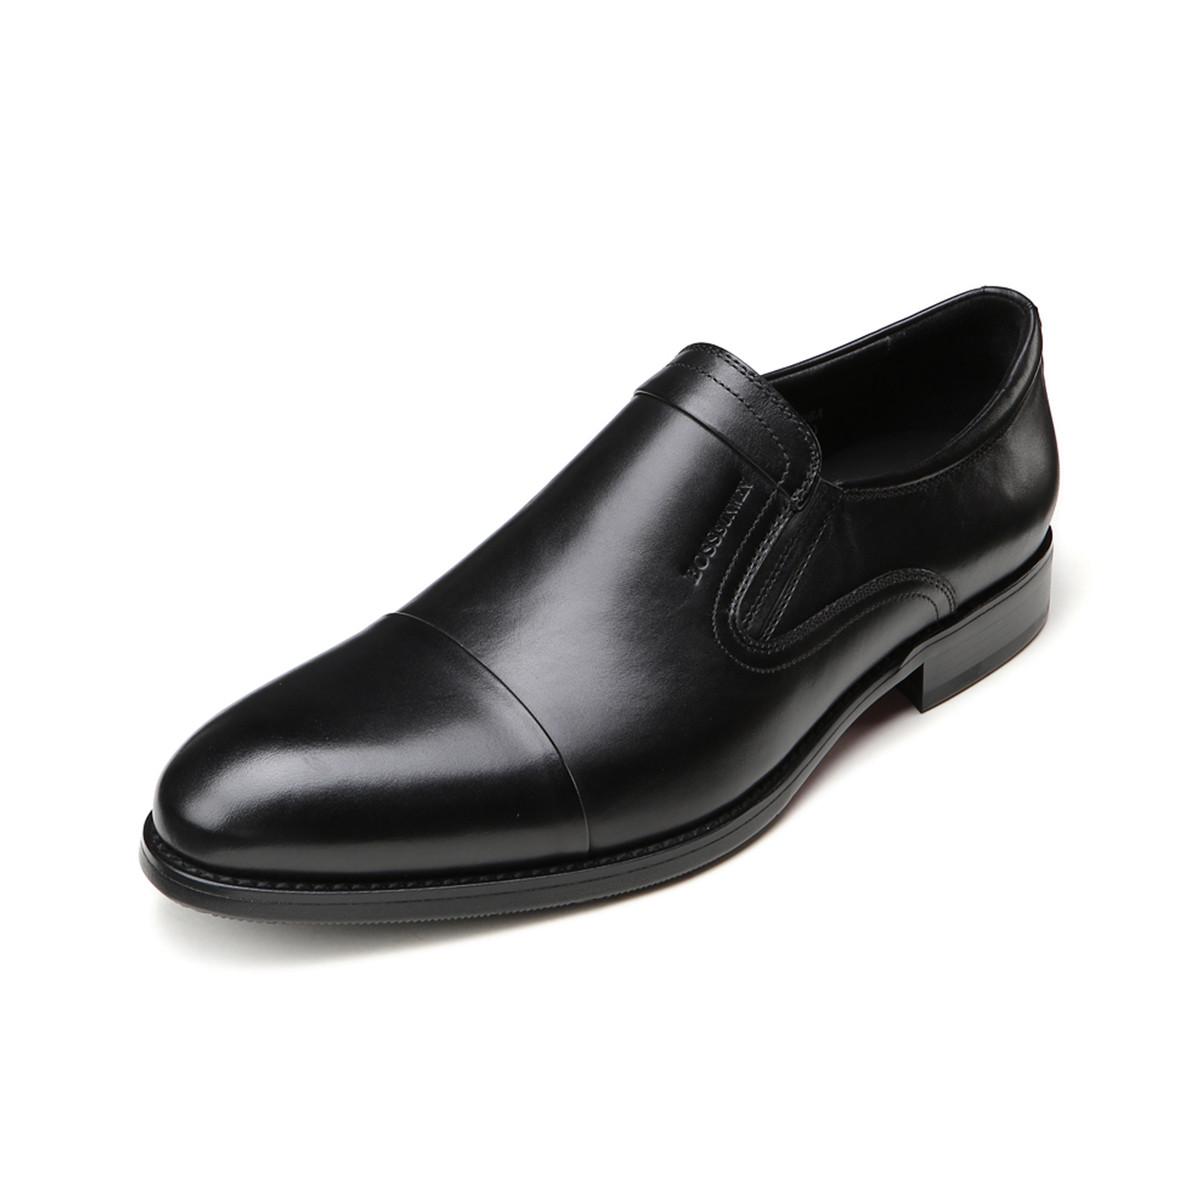 BOSSSUNWEN牛皮一脚蹬男鞋男士商务皮鞋男皮鞋男鞋男士皮鞋男鞋R31DB0406A